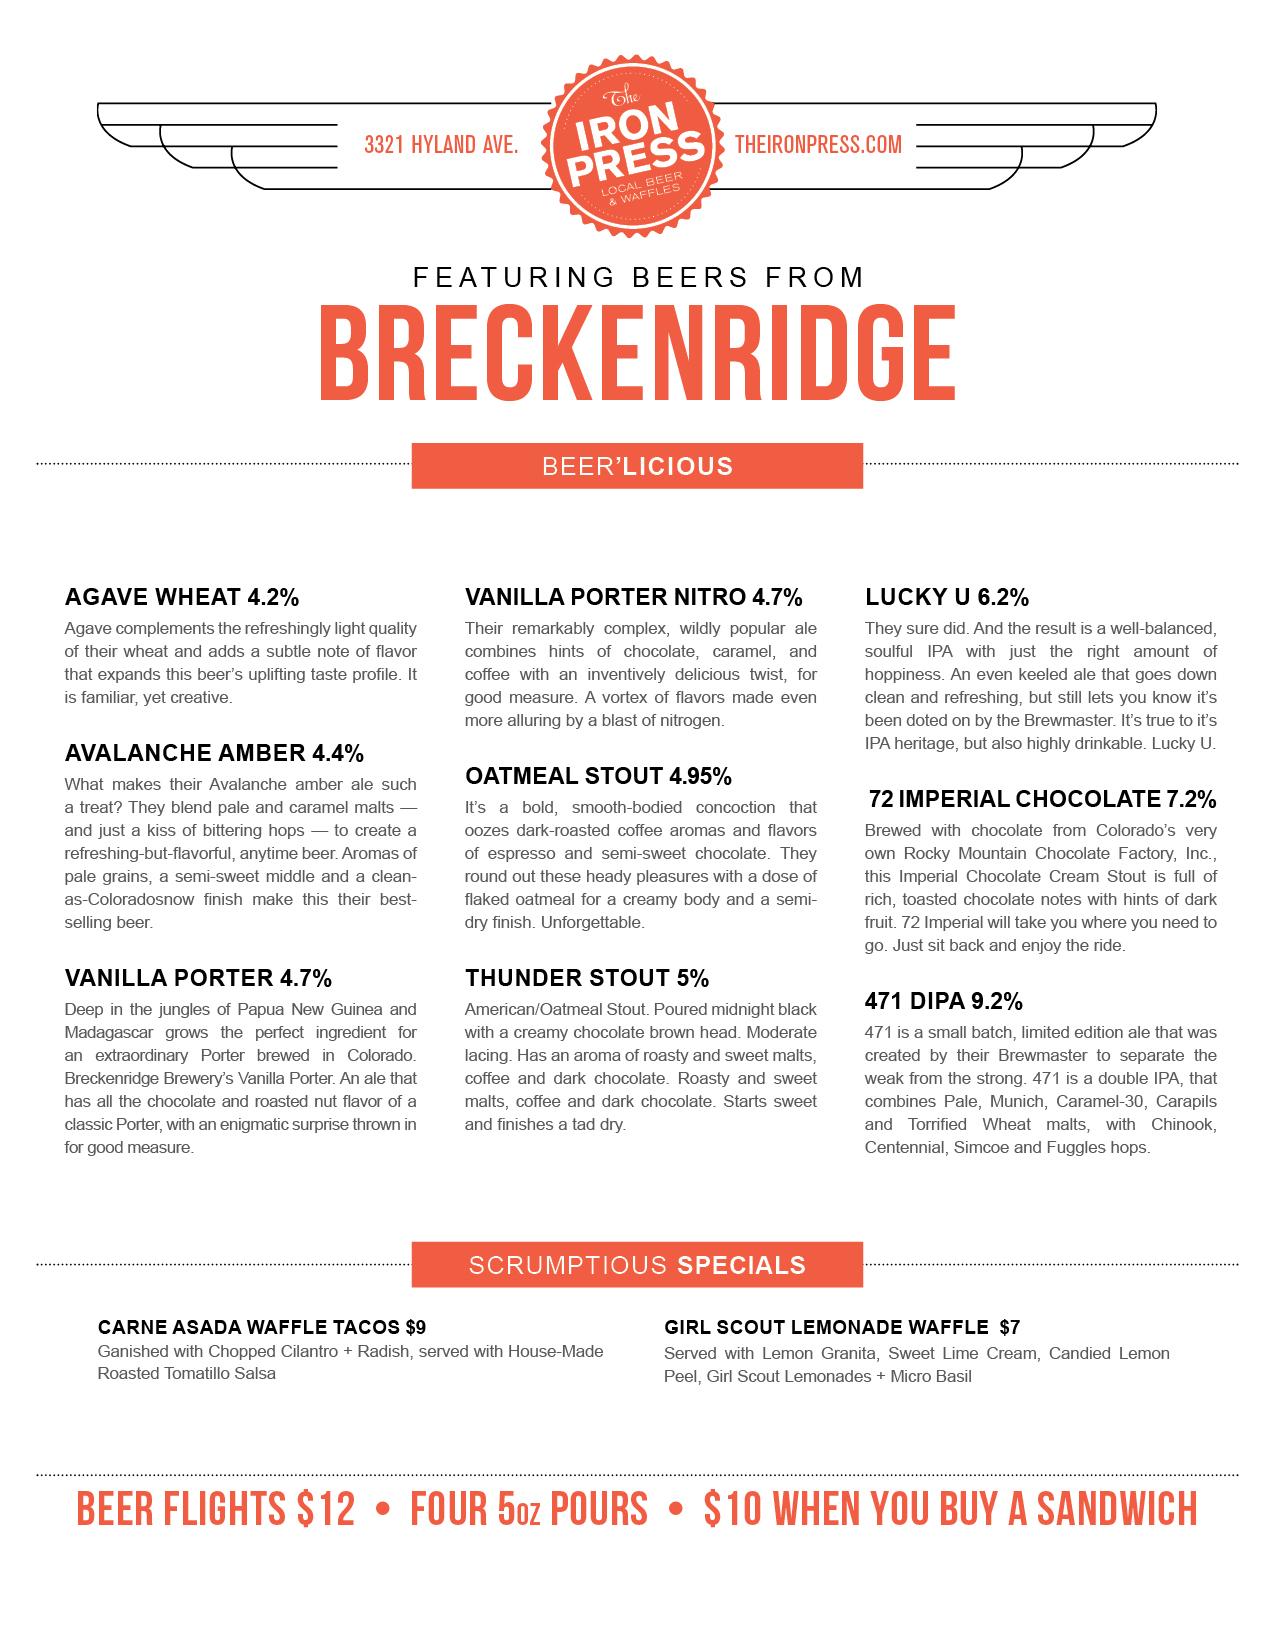 Breckenridge Brewery x The Iron Press